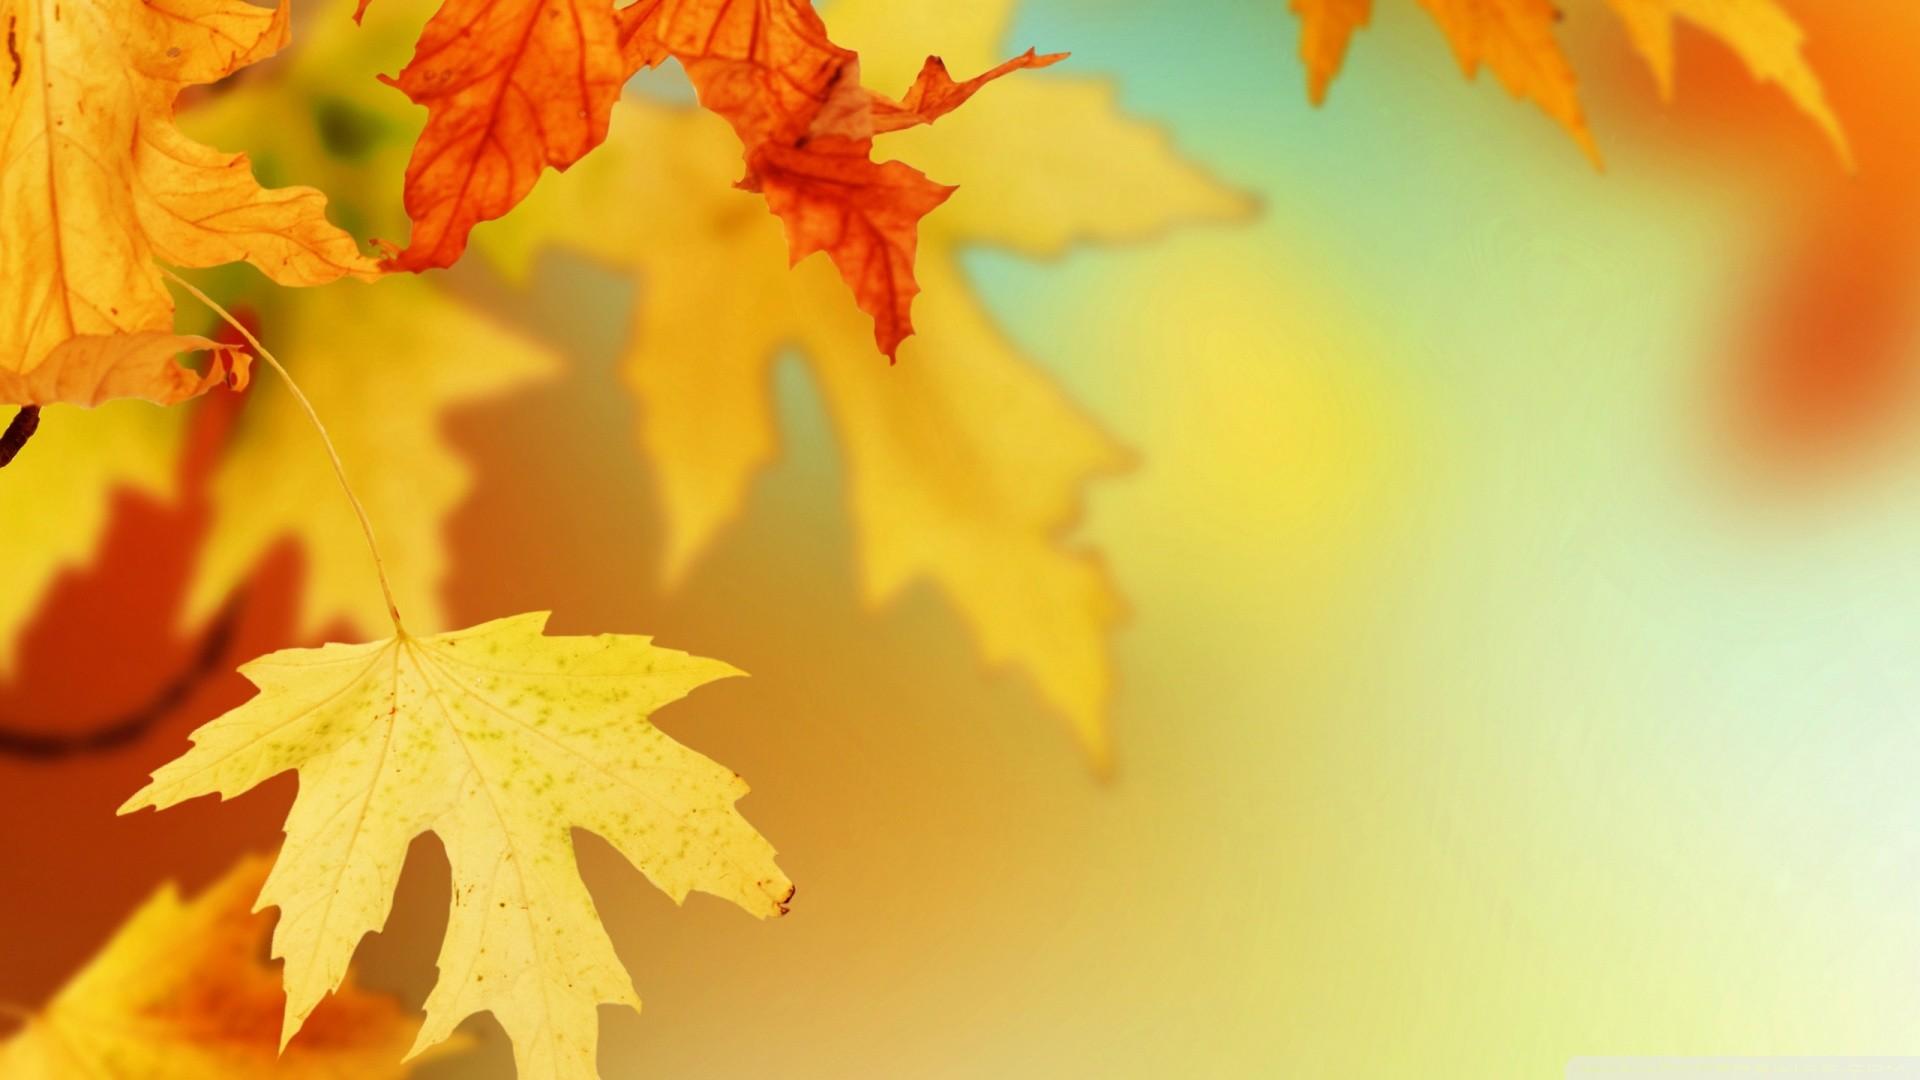 Download <b>autumn Wallpaper Background</b> | 25971